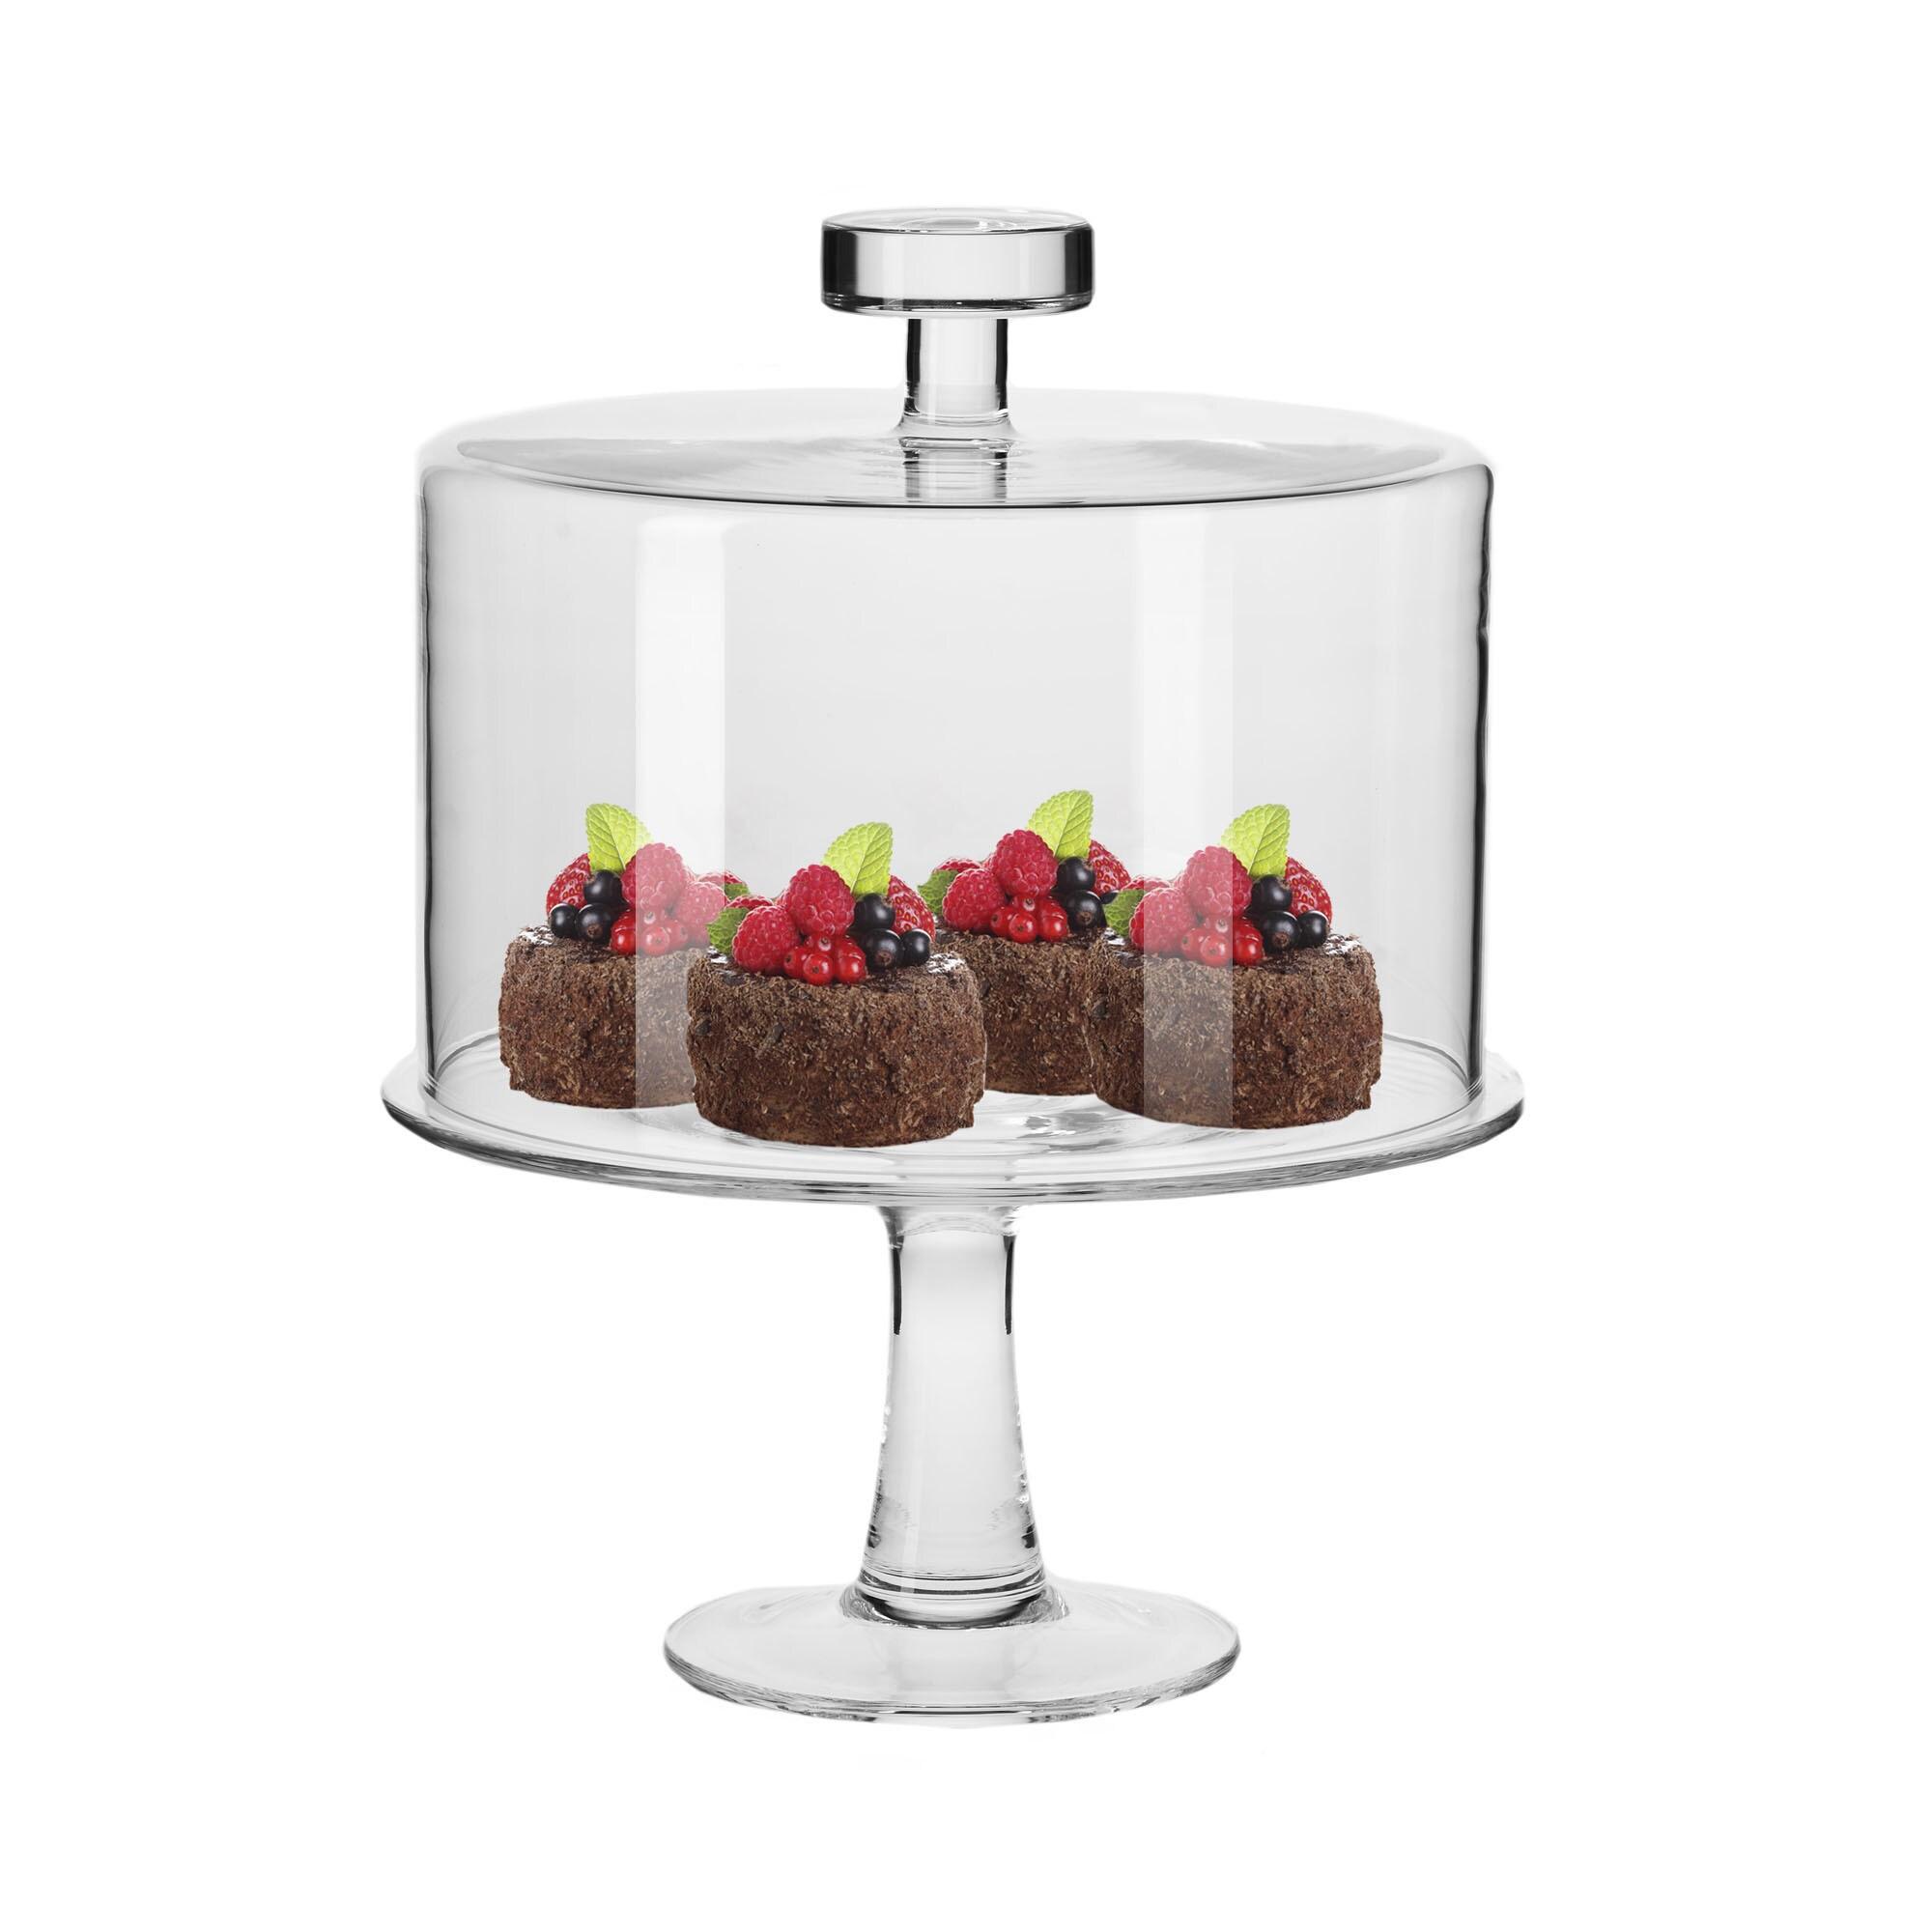 Krosno June 11 inch Diameter Handmade Cake Stand with Glass Cover